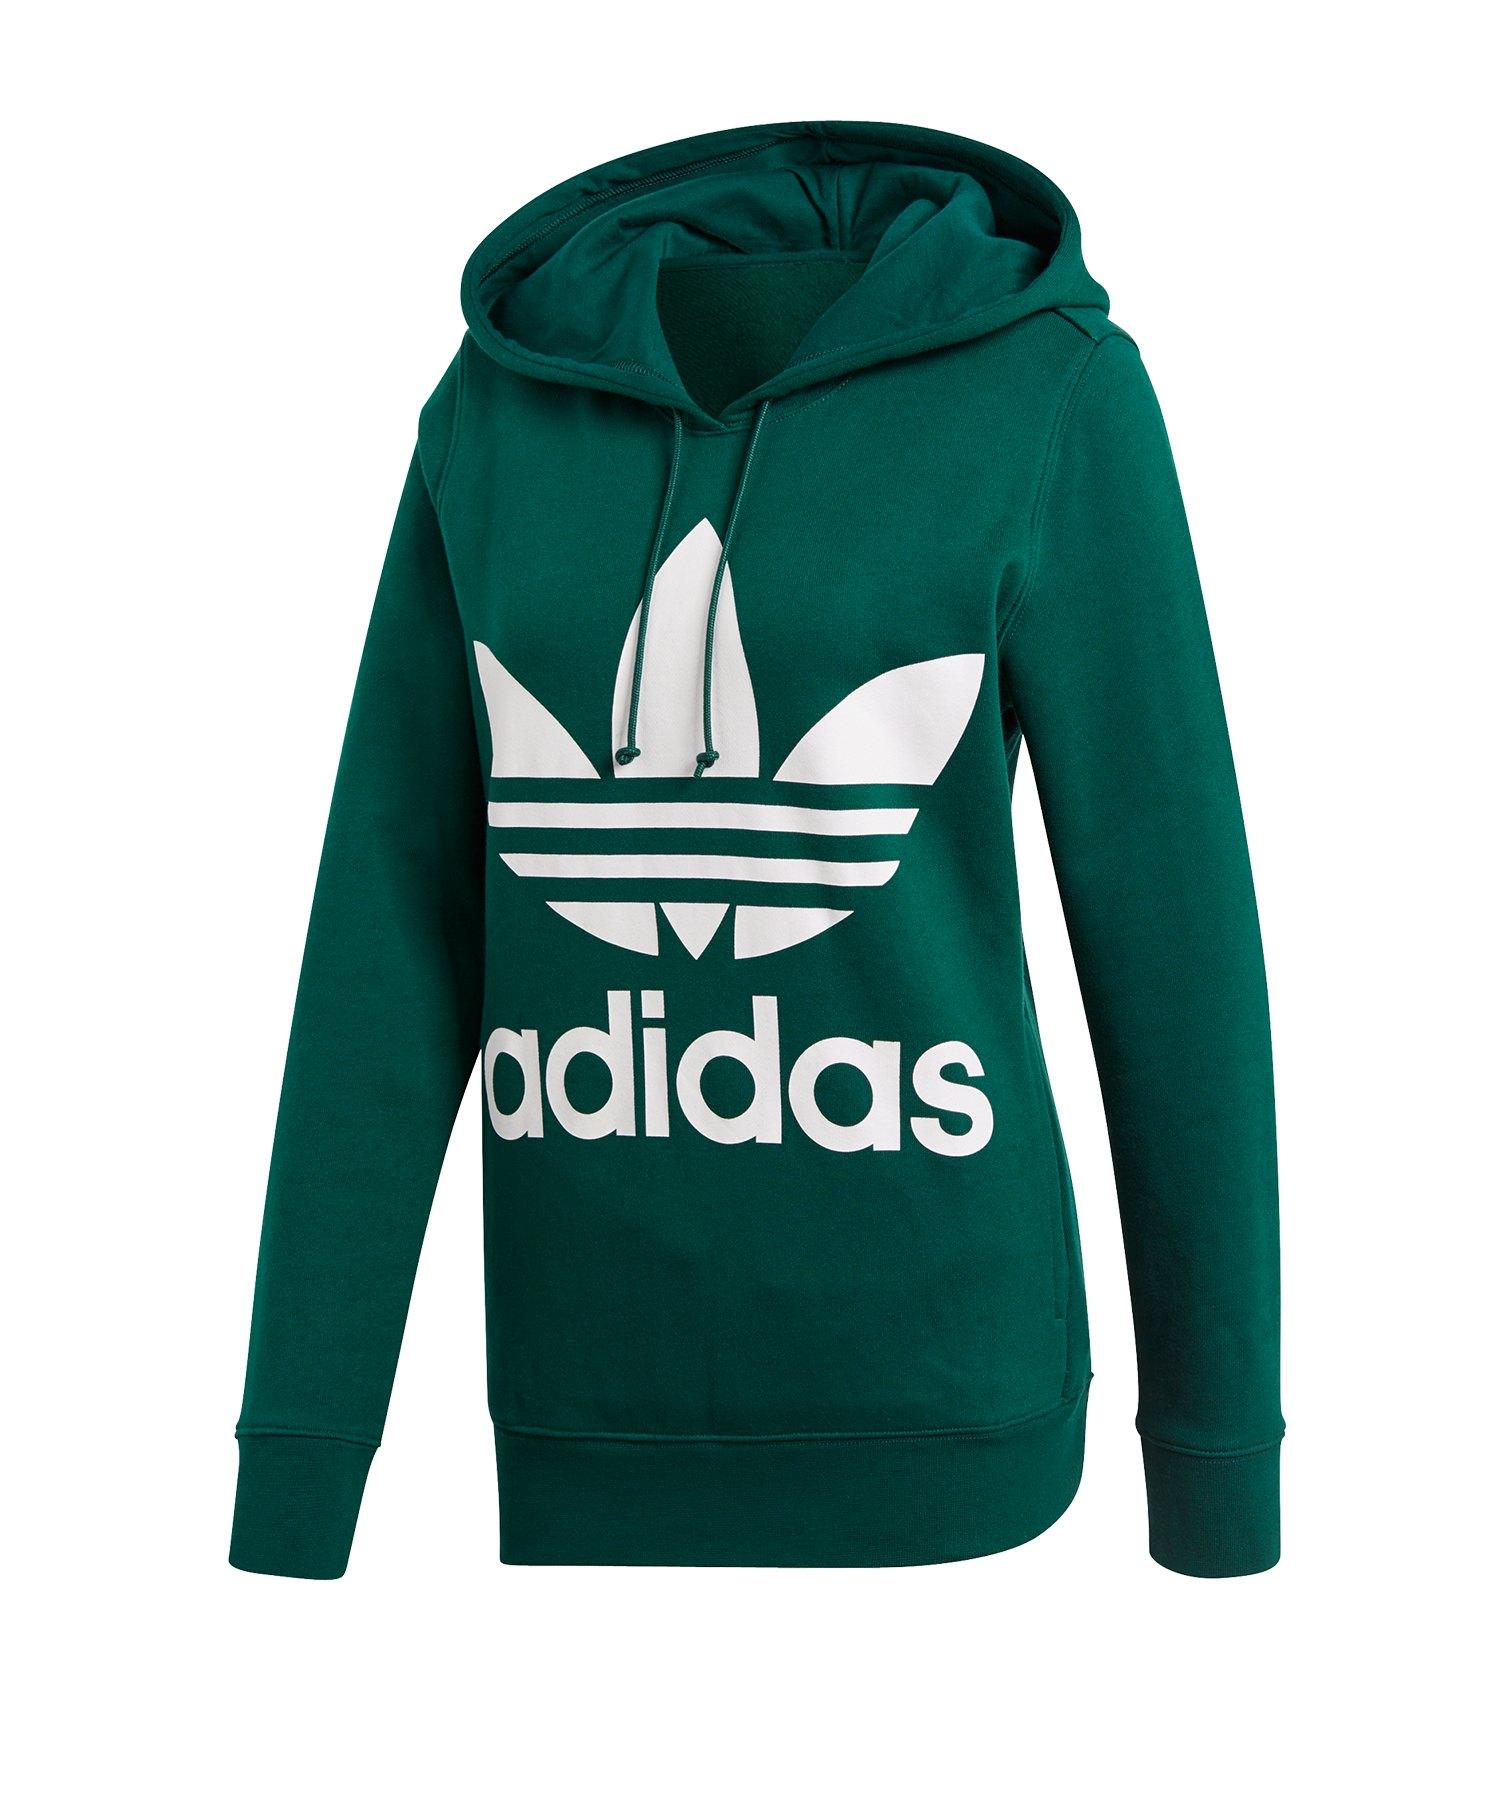 sehen 51f89 e2c08 adidas trefoil hoodie grün refugium